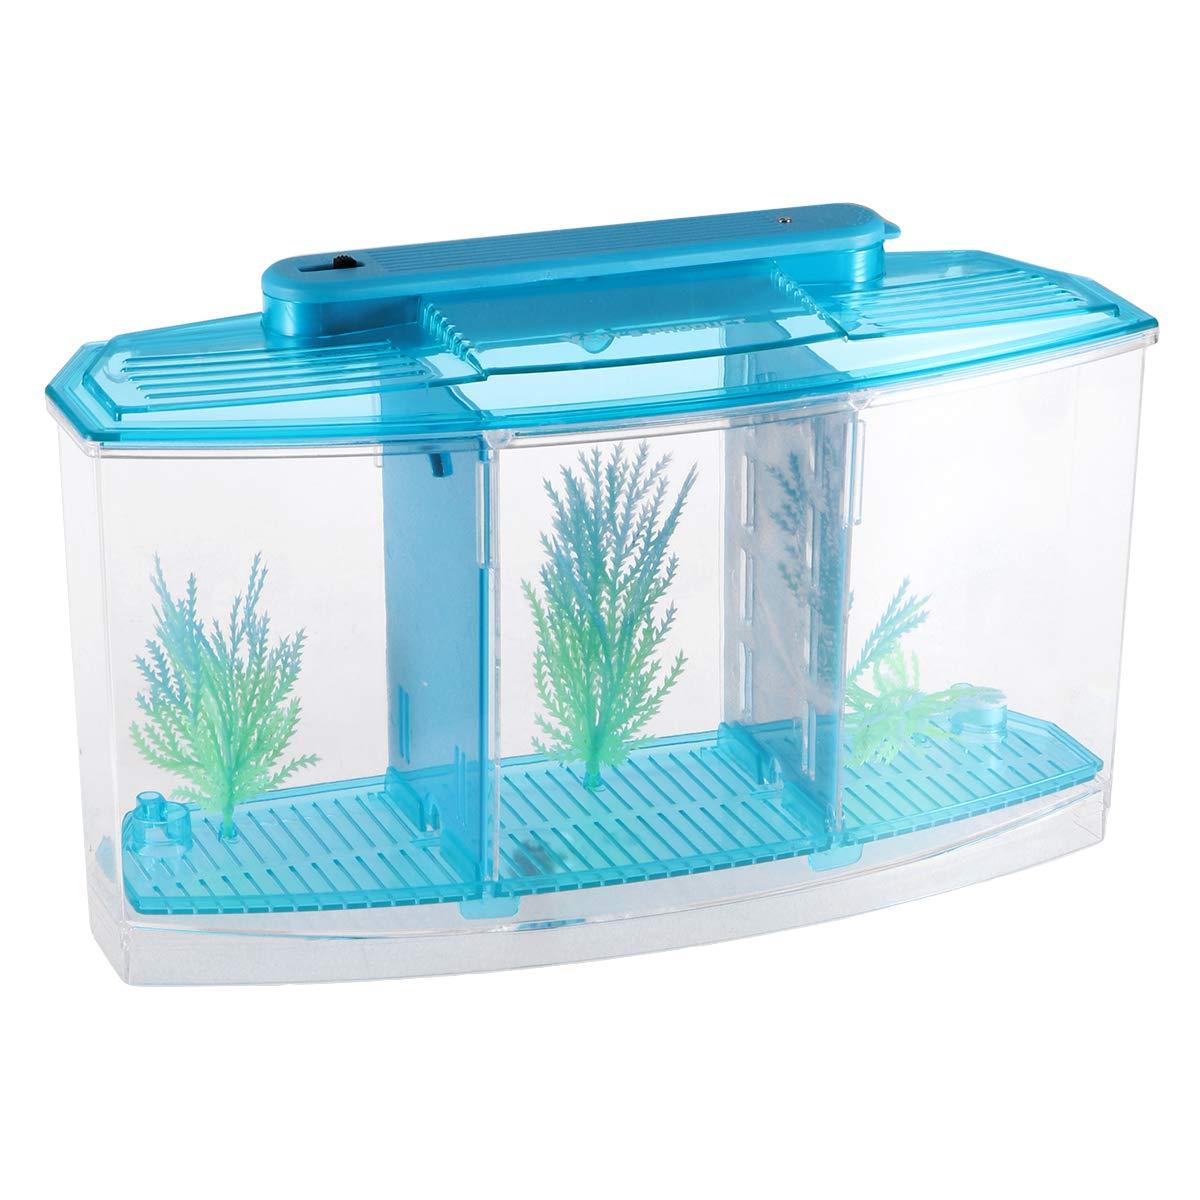 POPETPOP Mini Desktop Aquariums Fish Tank Ecological Goldfish Tank Hatchery Breeder Box for Living Office and Home dÃcor(Blue) by POPETPOP (Image #1)